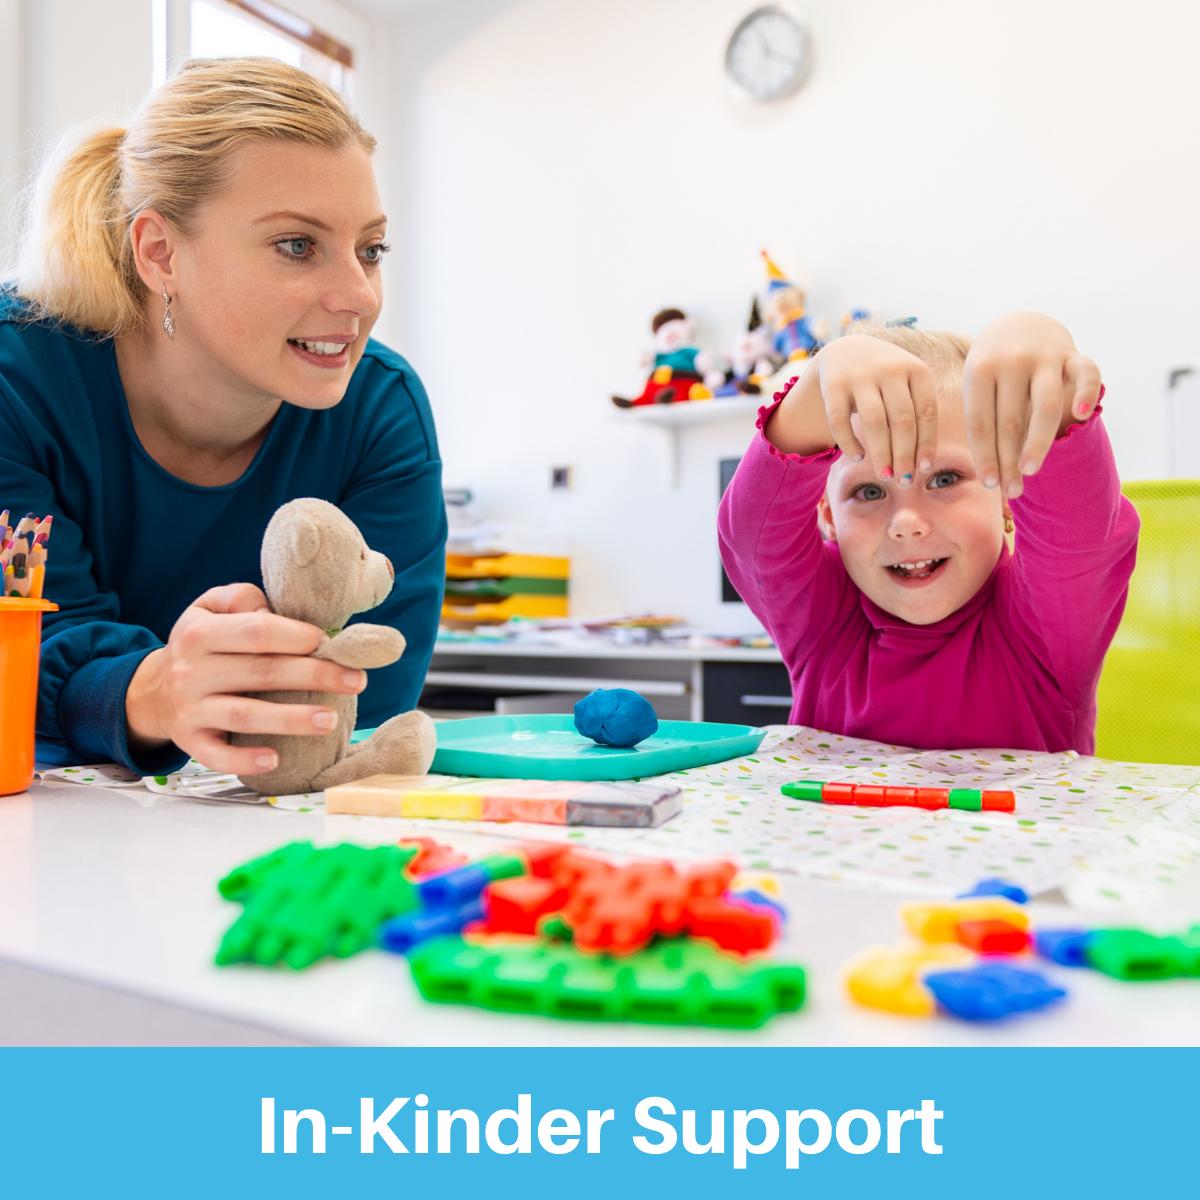 In-Kinder Support